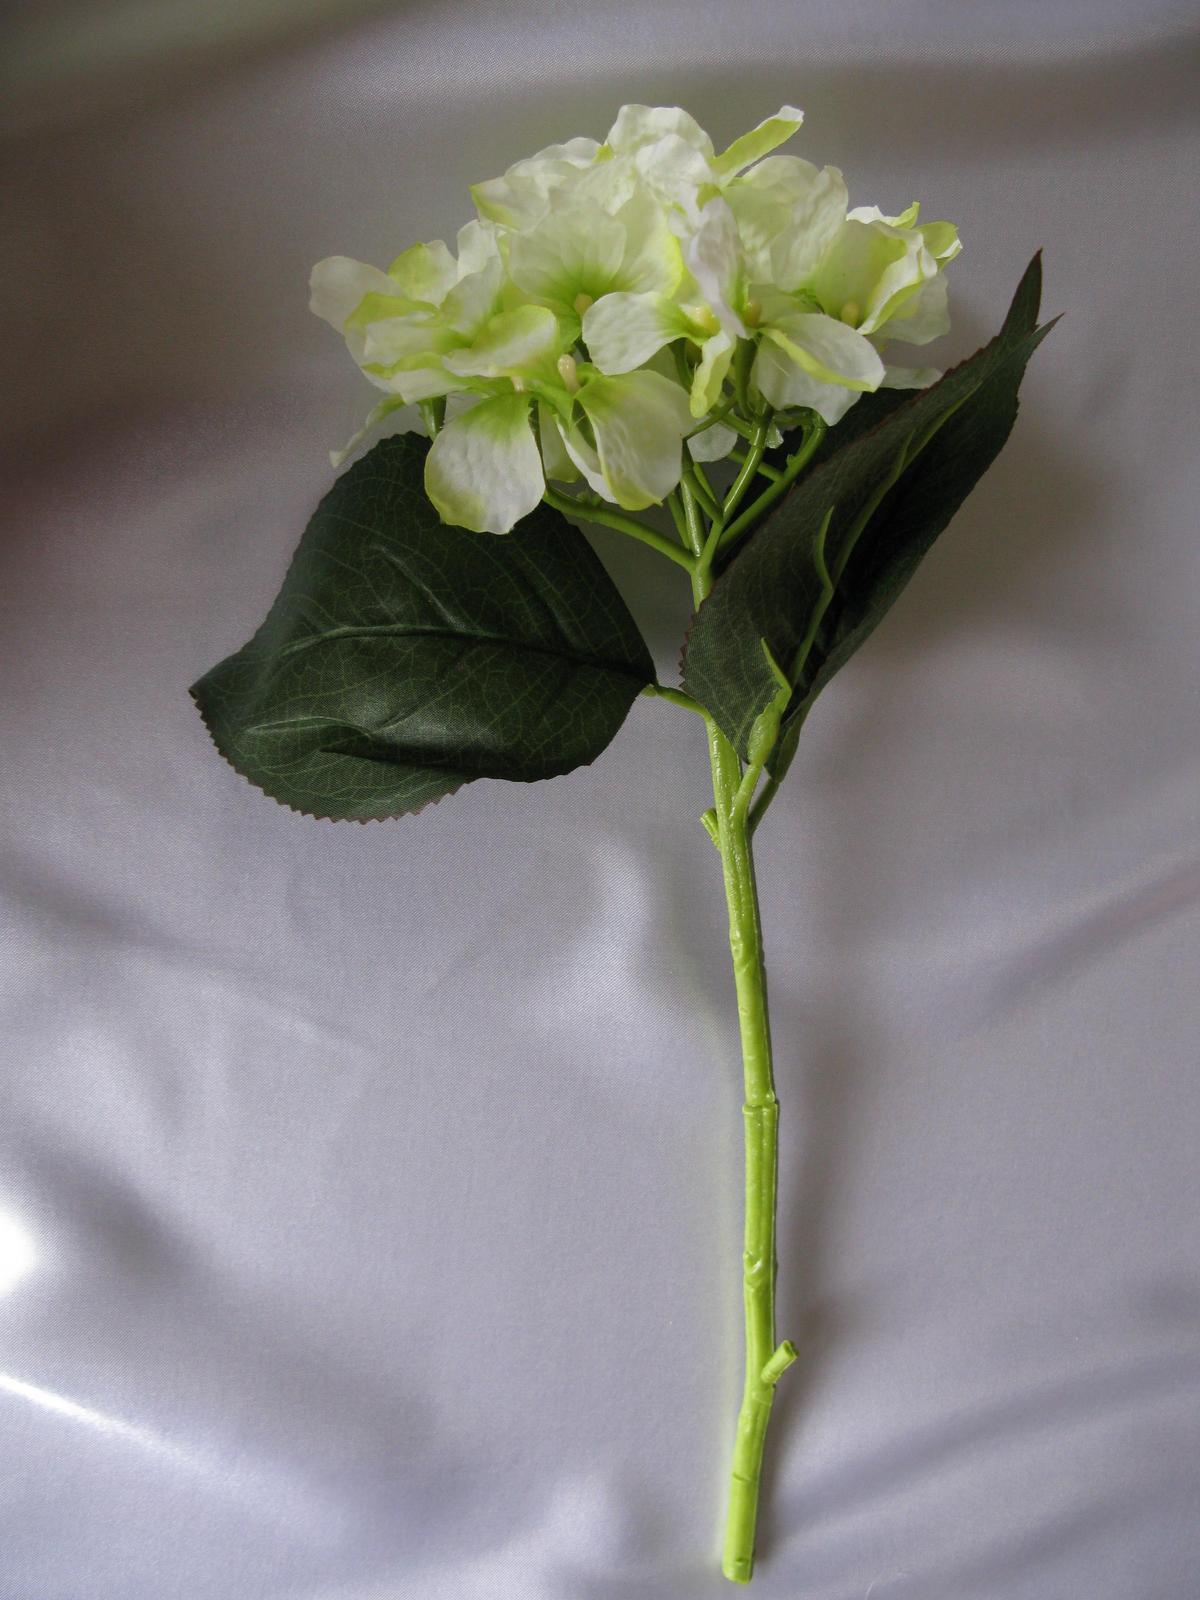 Umělá hortensie - Obrázek č. 1